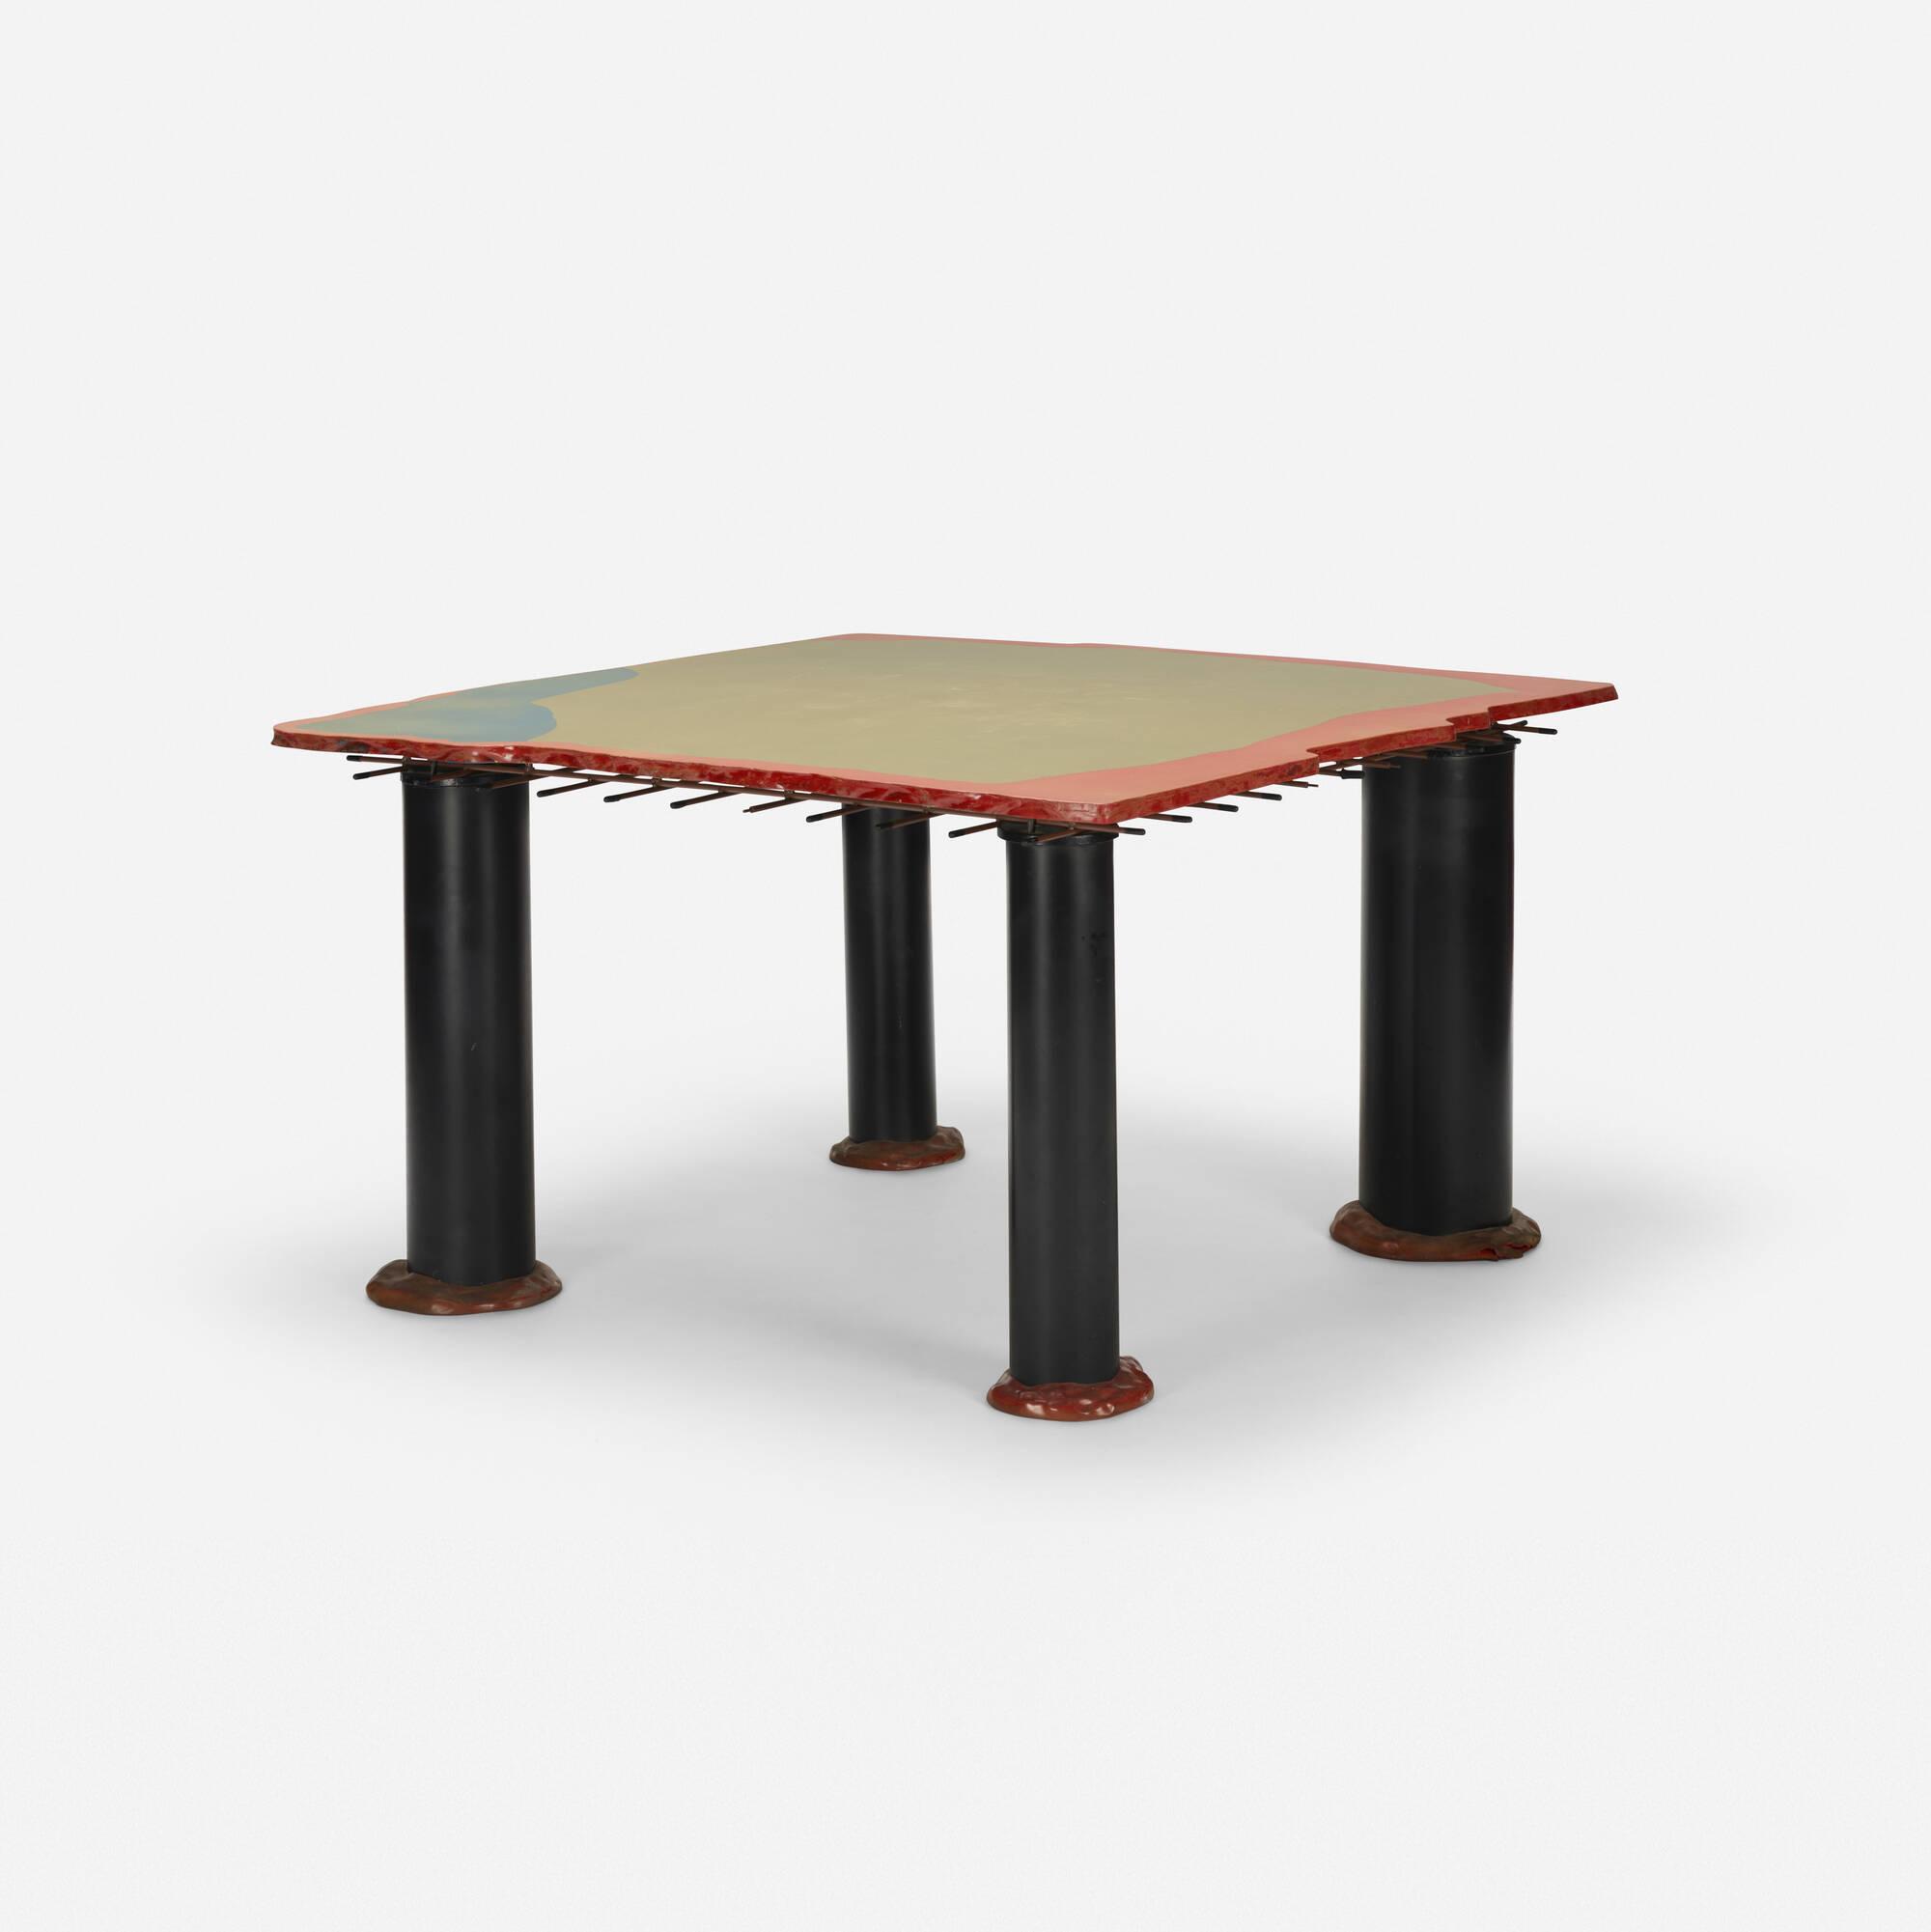 430: Gaetano Pesce / Sansone II dining table (1 of 3)